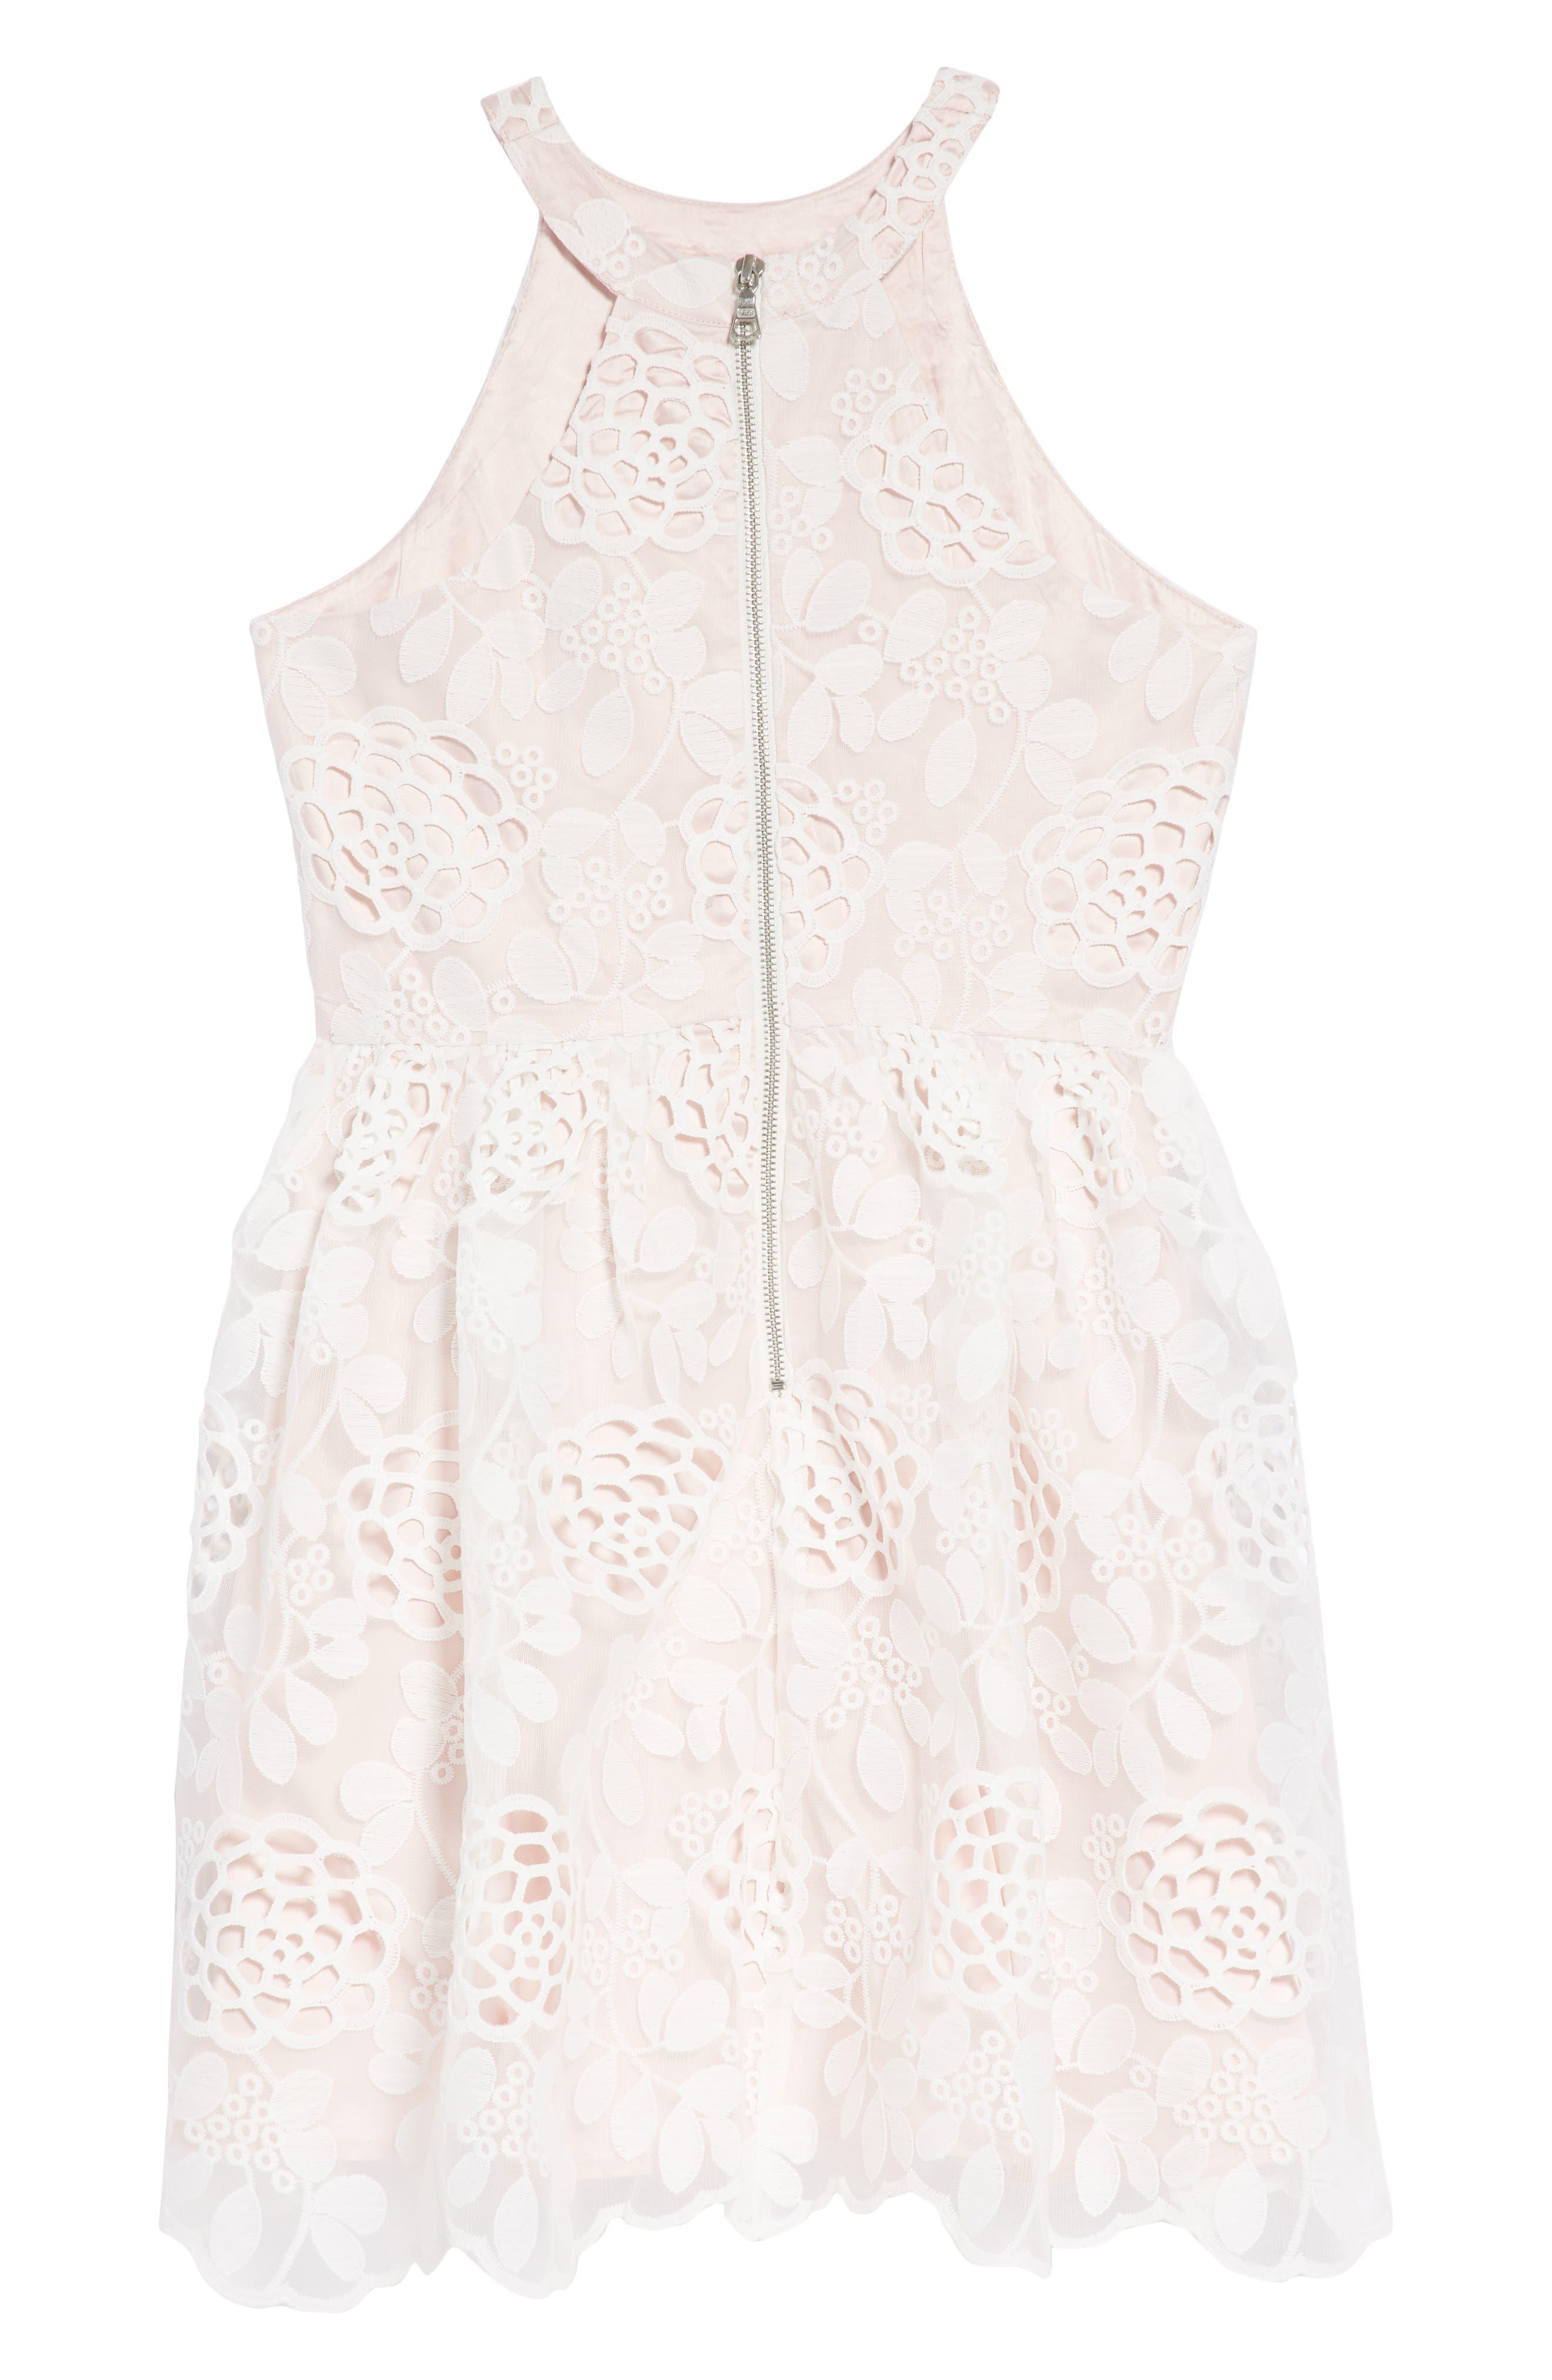 Primrose Lace Dress,                             Alternate thumbnail 2, color,                             Orchid White